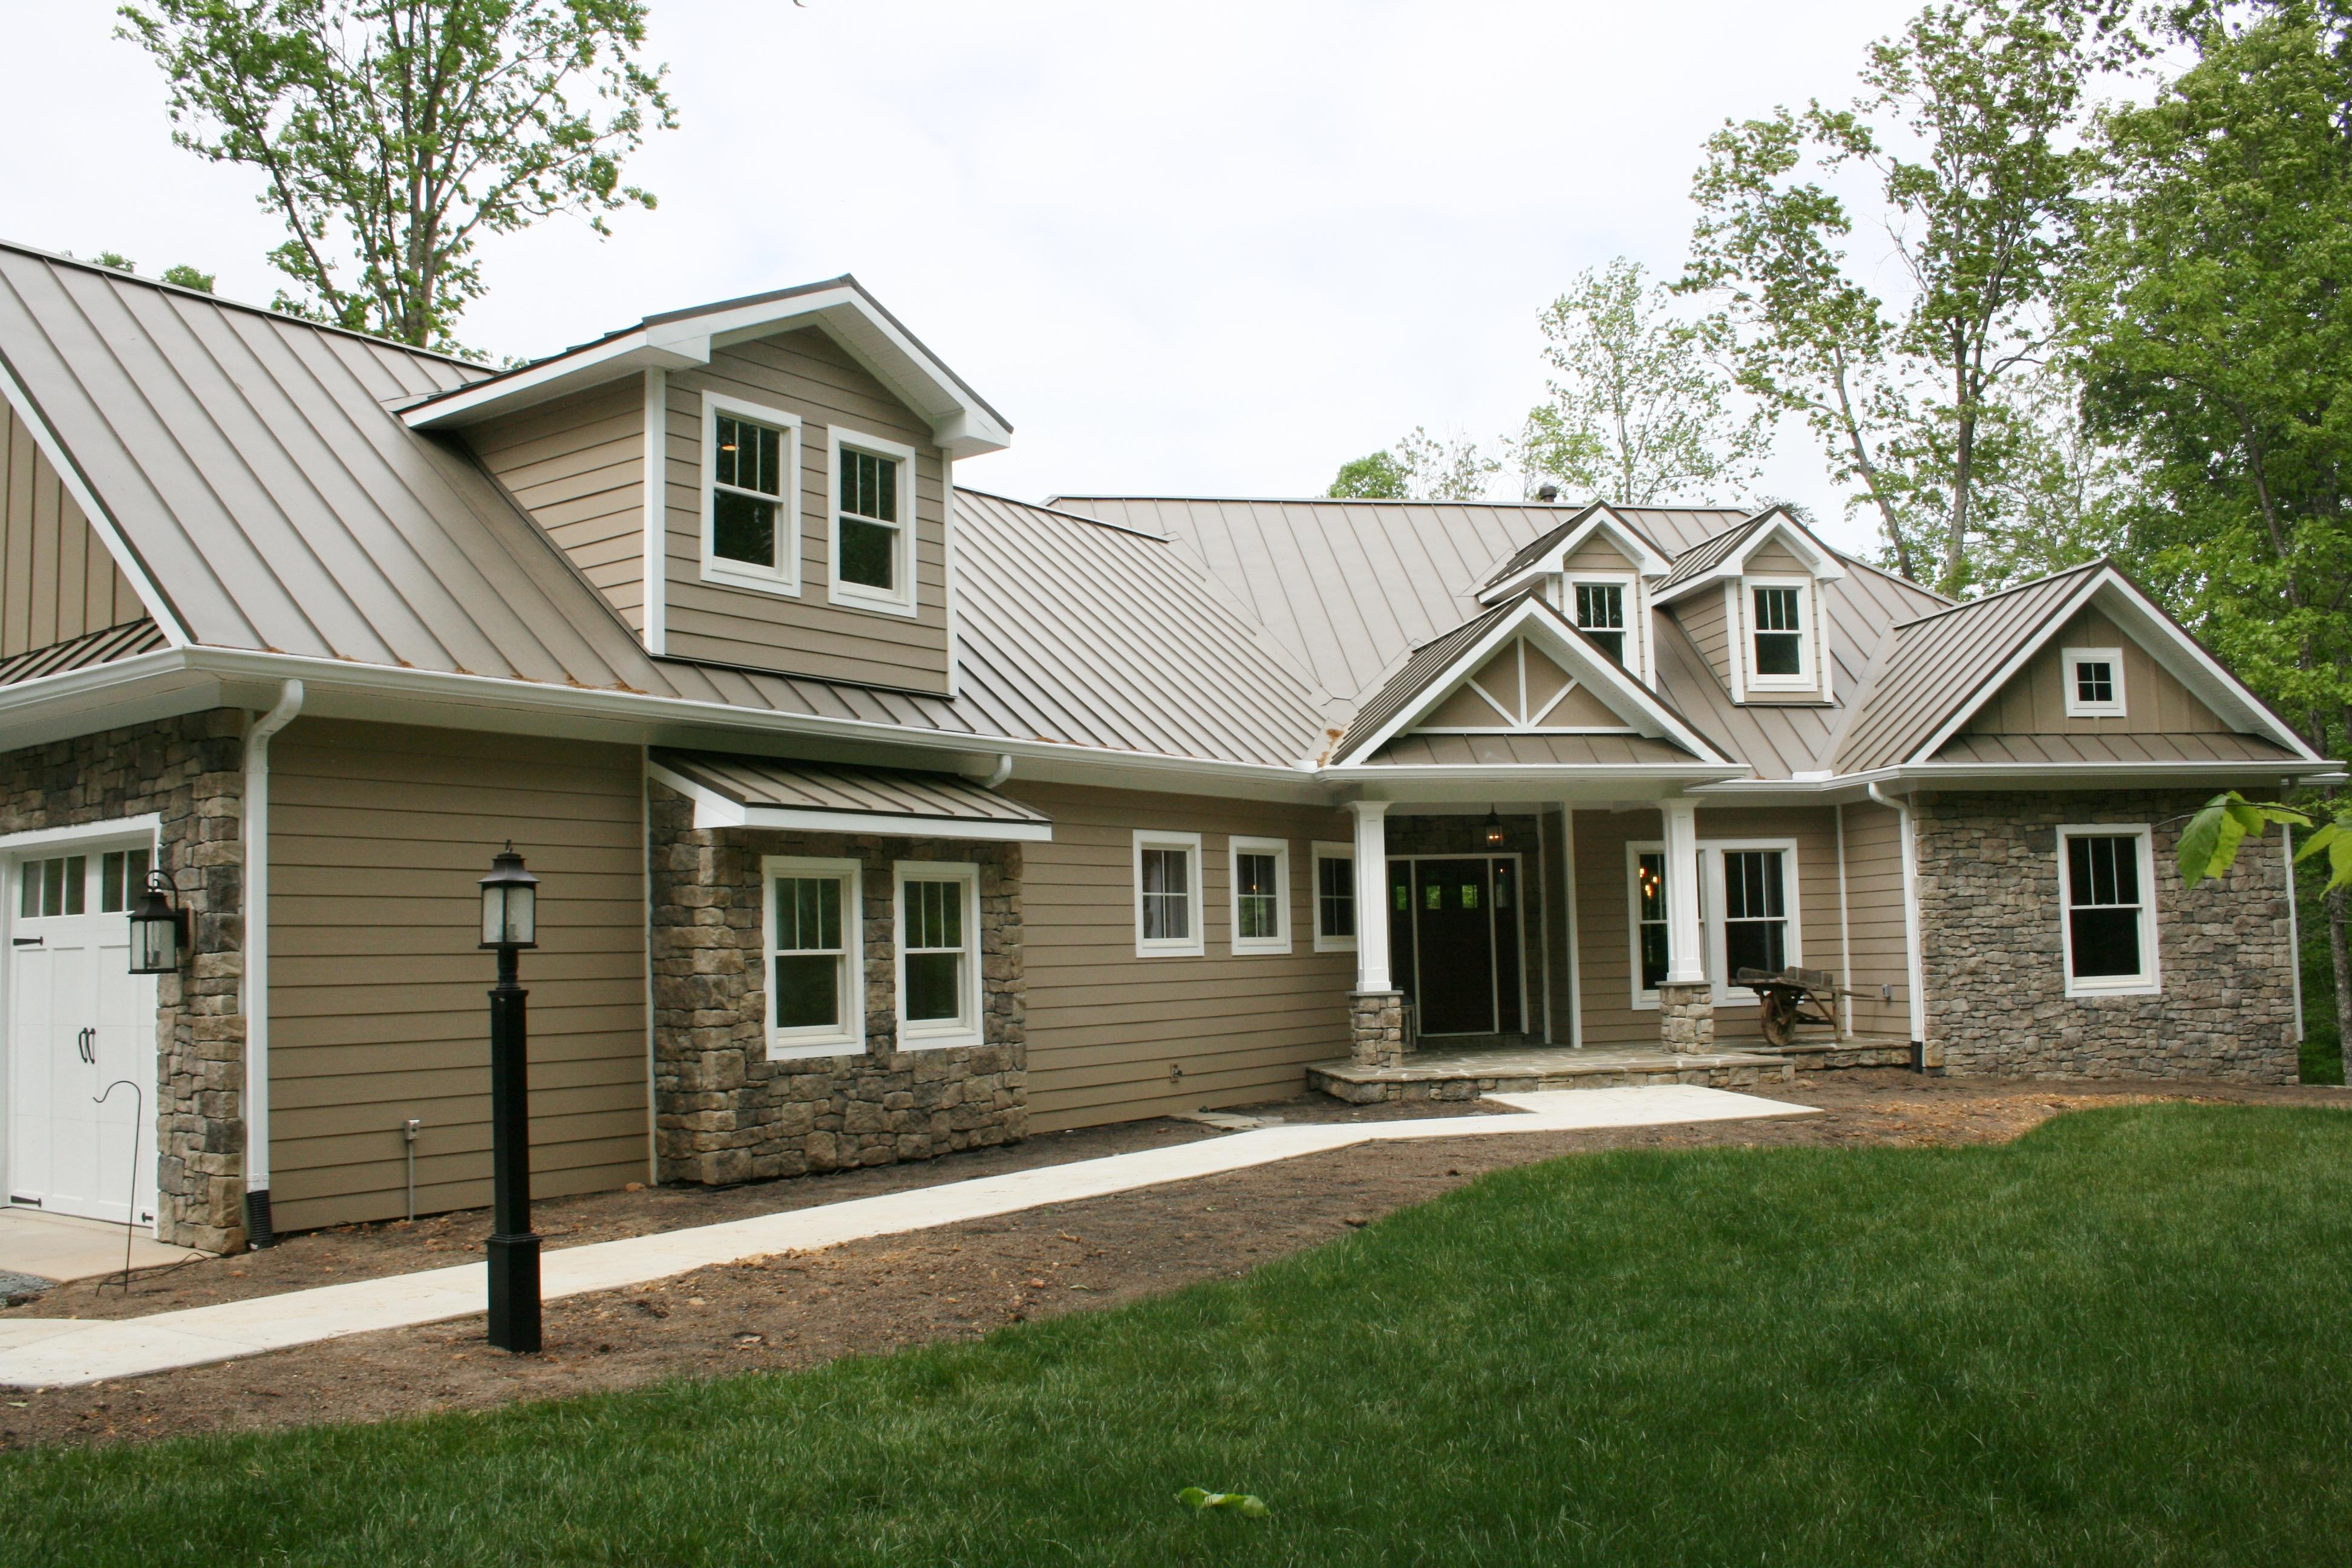 Hardi Plank Siding >> New Construction Custom Home, Warrenton, VA